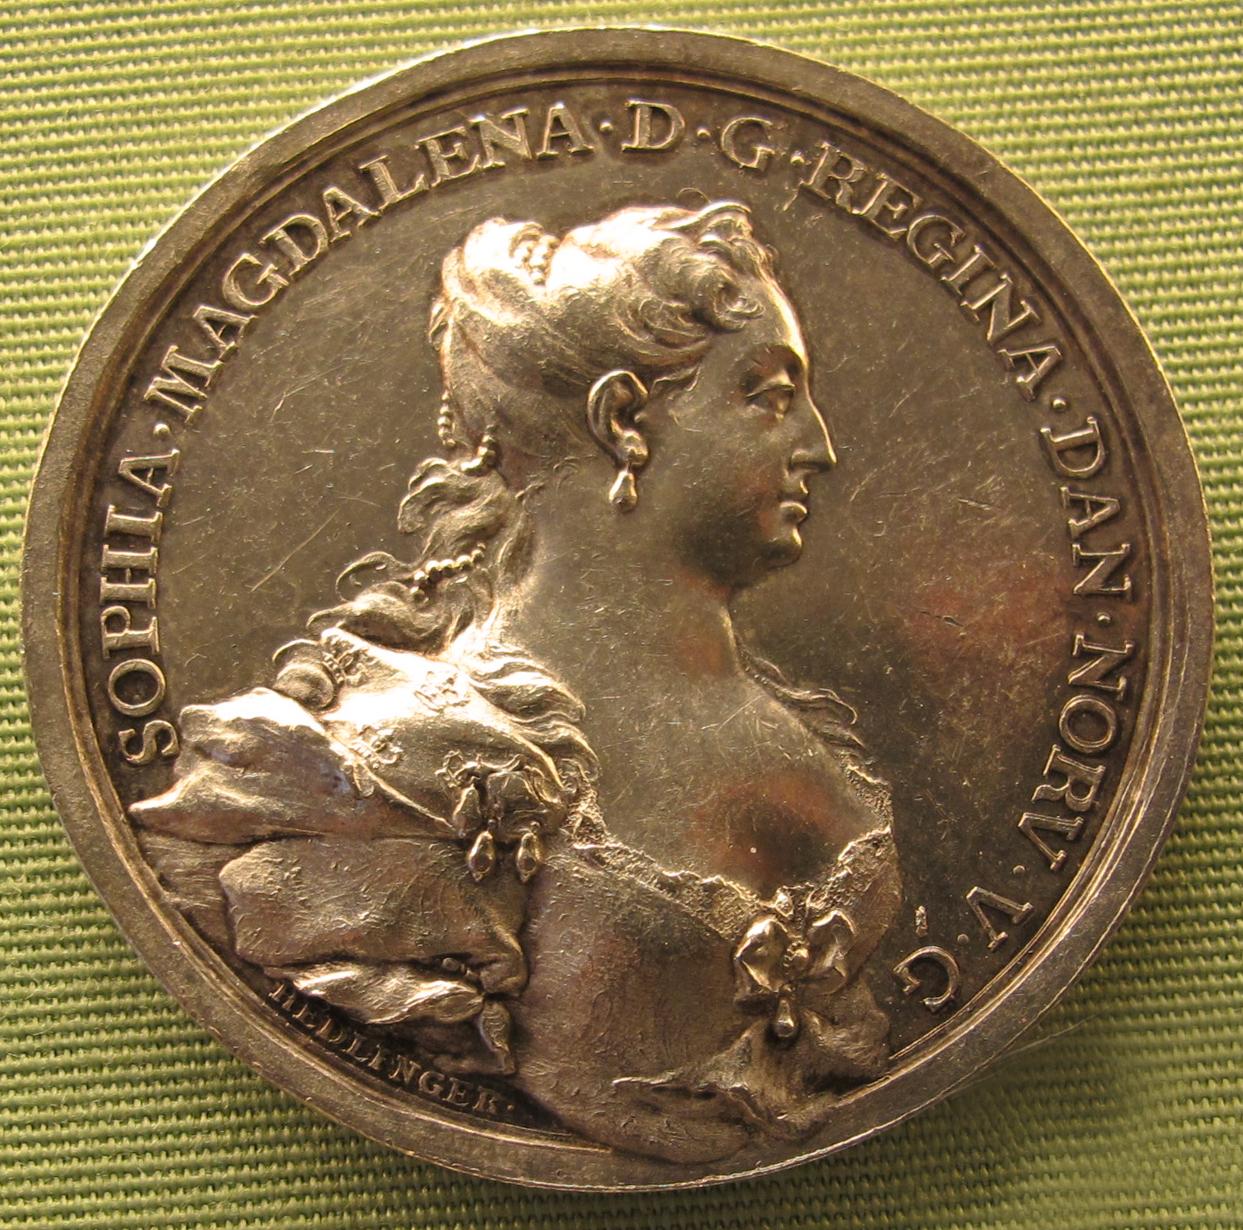 File:Johann carl hedlinger, sofia maddalena, regina di danimarca, 1737.JPG